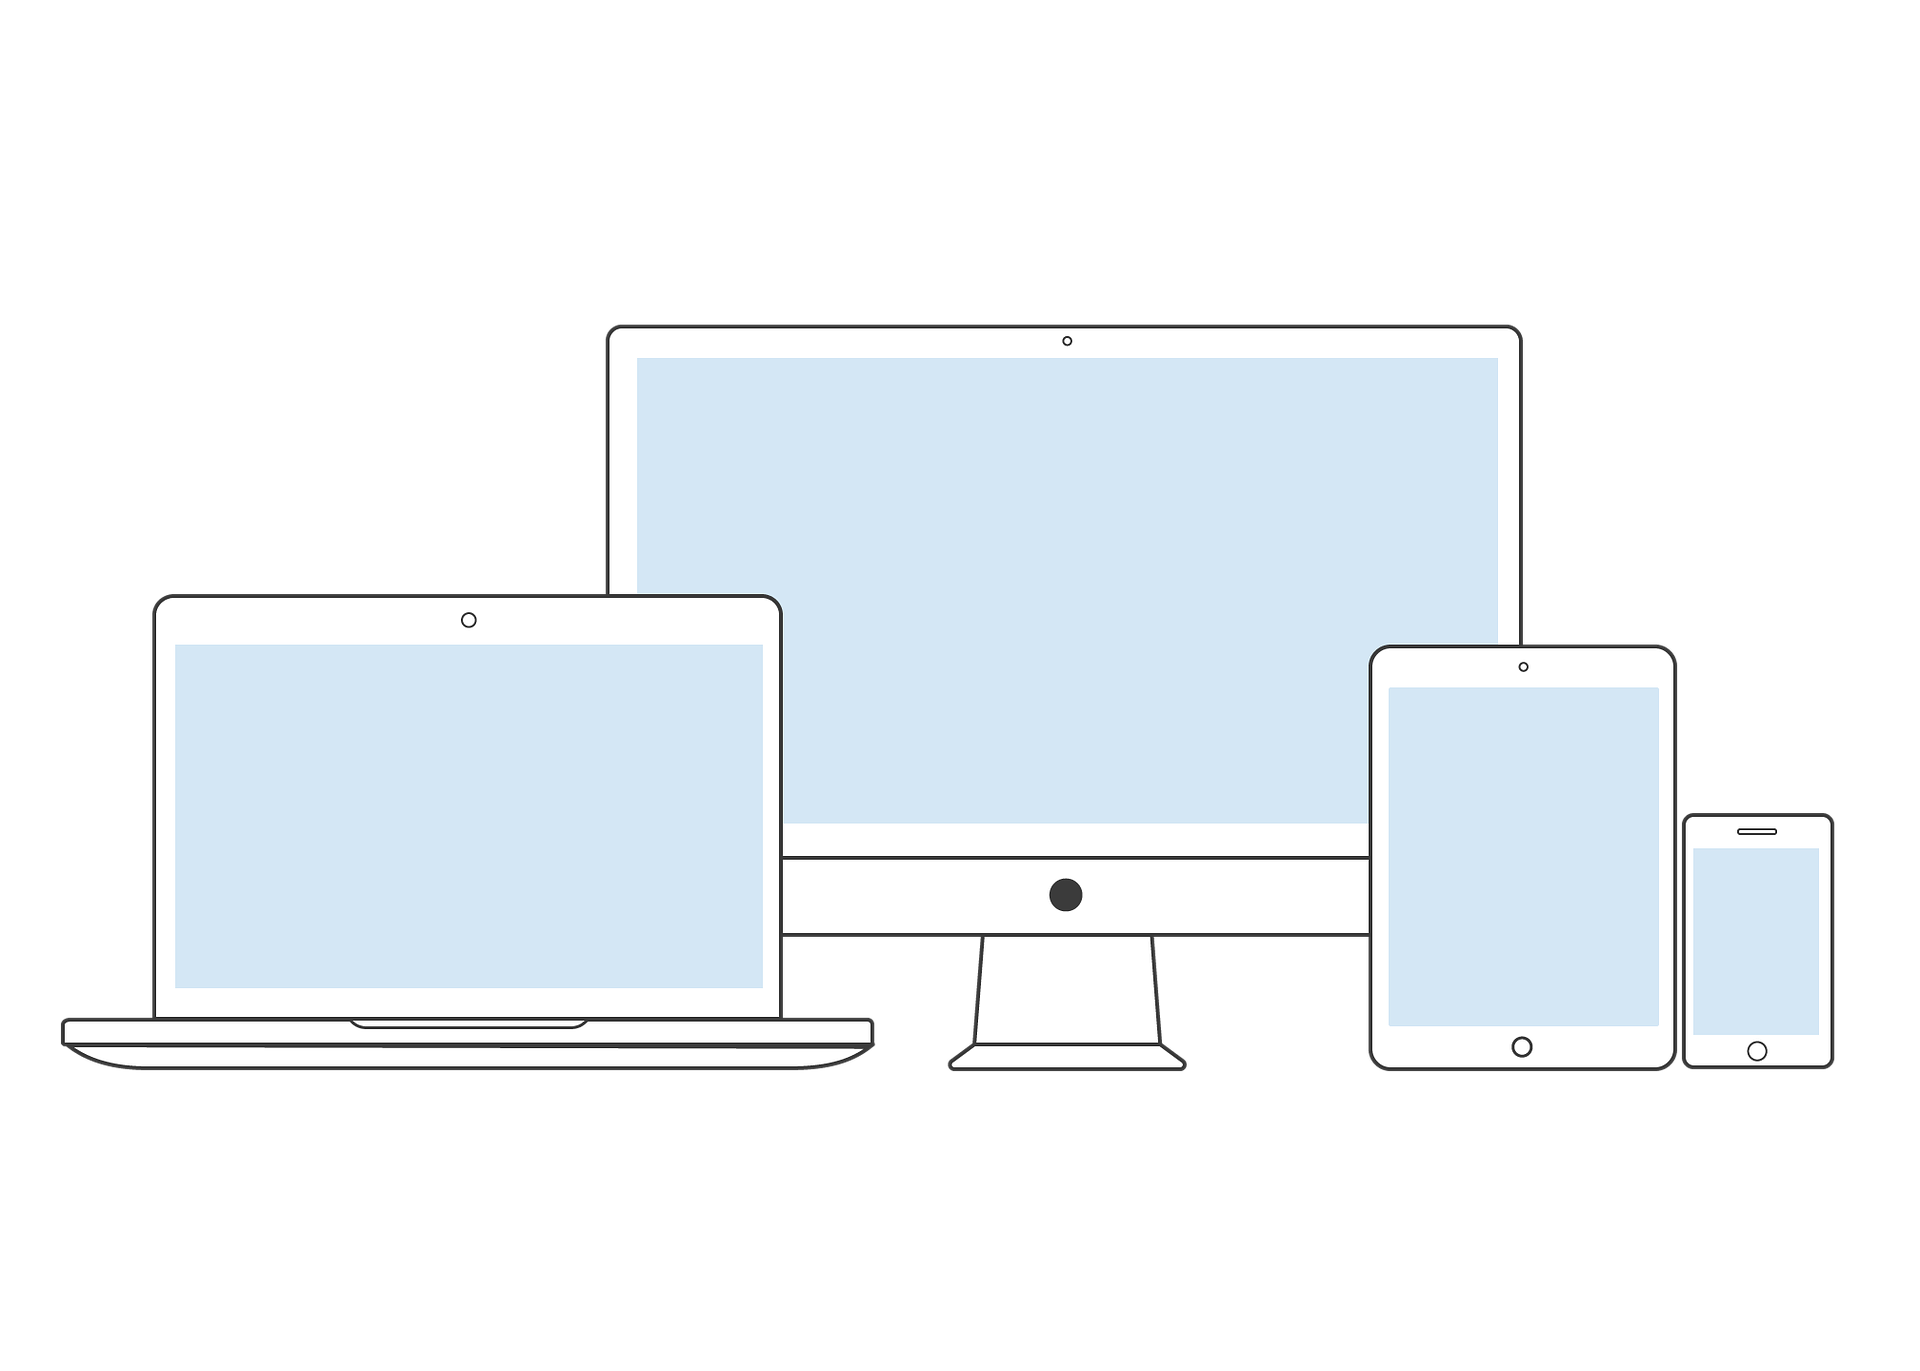 Web Design Berlin | Webdesign Berlin Ihre Agentur Fur Web Video Karmapix De